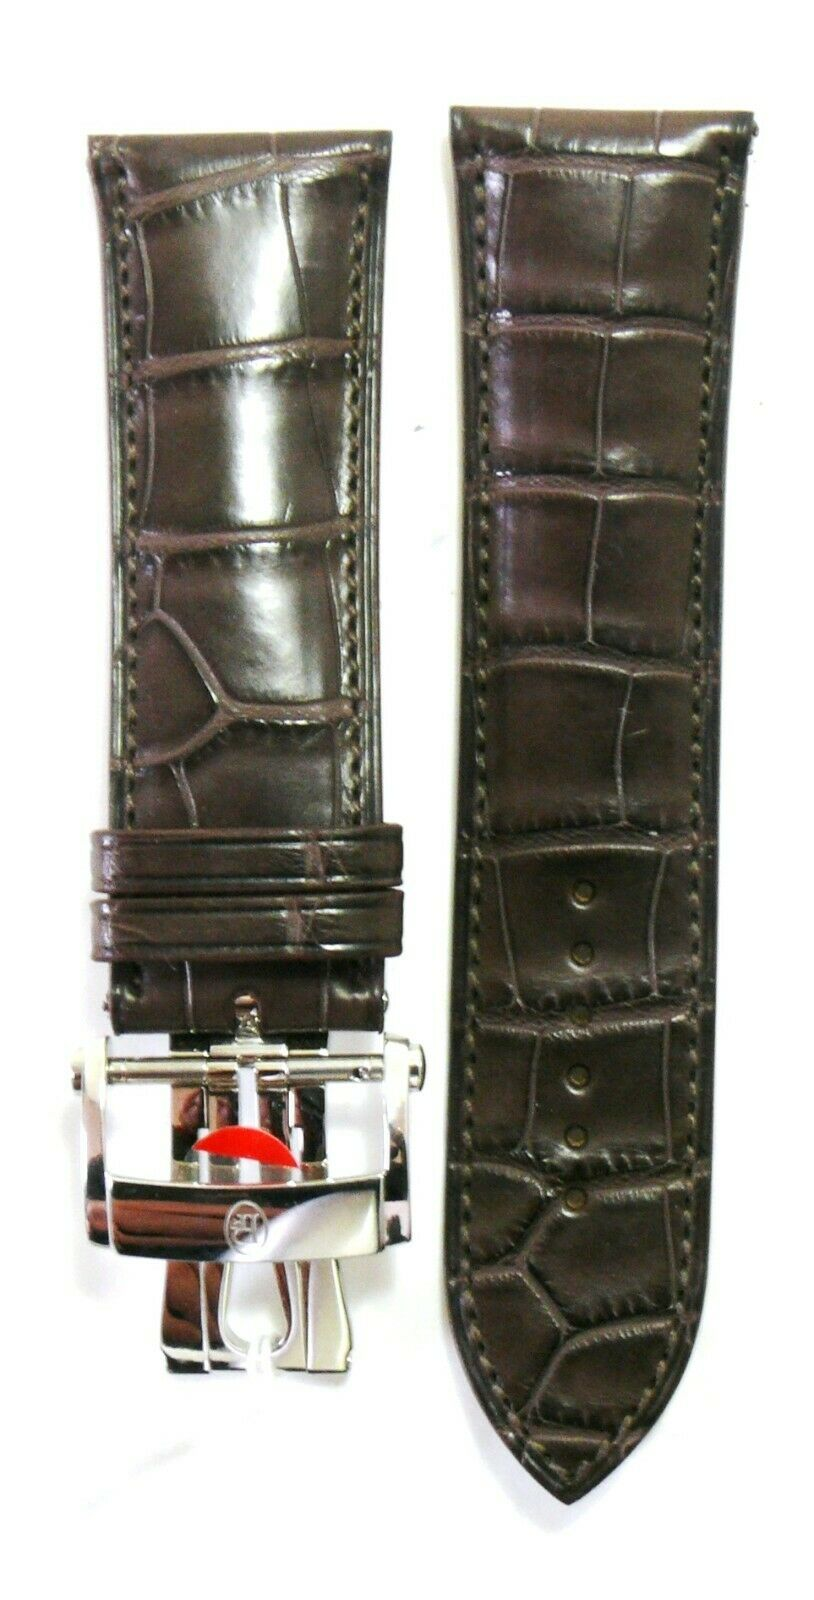 Genuine Parmigiani Fleurier Brown Watch Strap Hermes with buckle NEW 36189